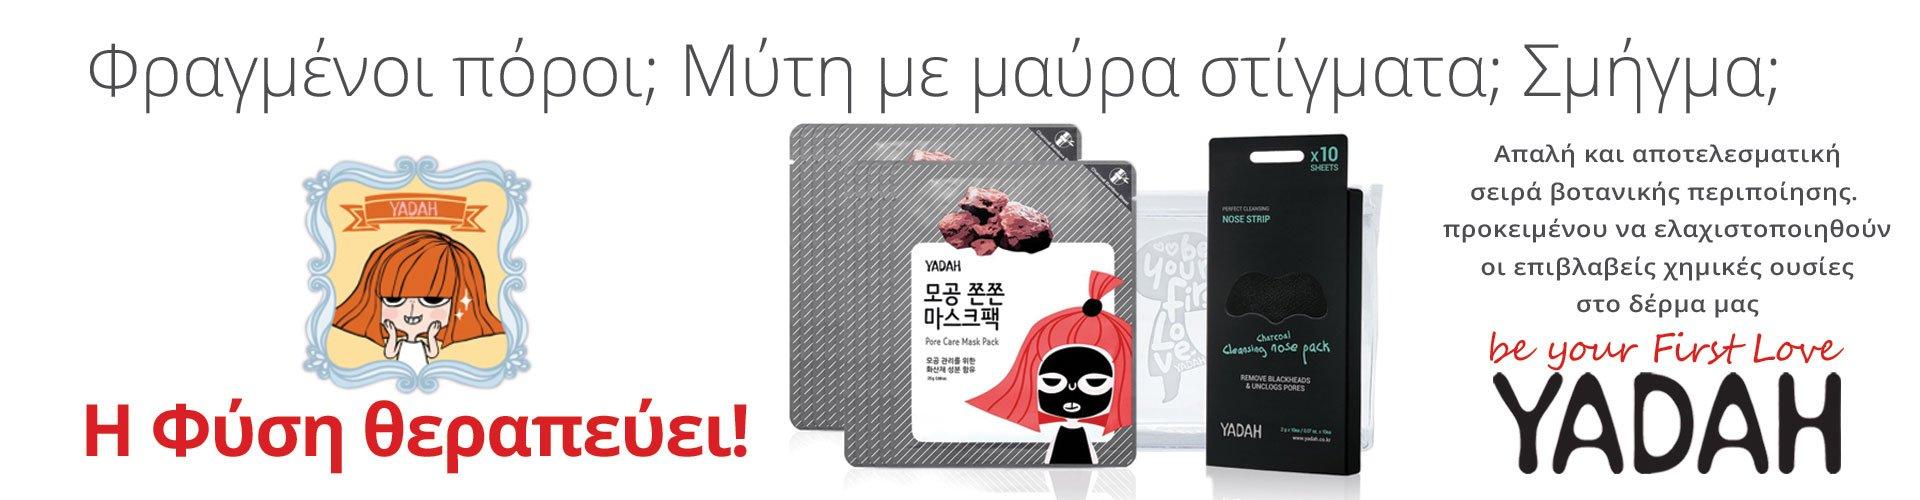 ONTS Φυσικά και Βιολογικά Προϊόντα Μακιγιάζ. YADAH.Τα προϊόντα Yadah είναι μία αυθεντική κορεάτικη και δημοφιλής σειρά καλλυντικών.